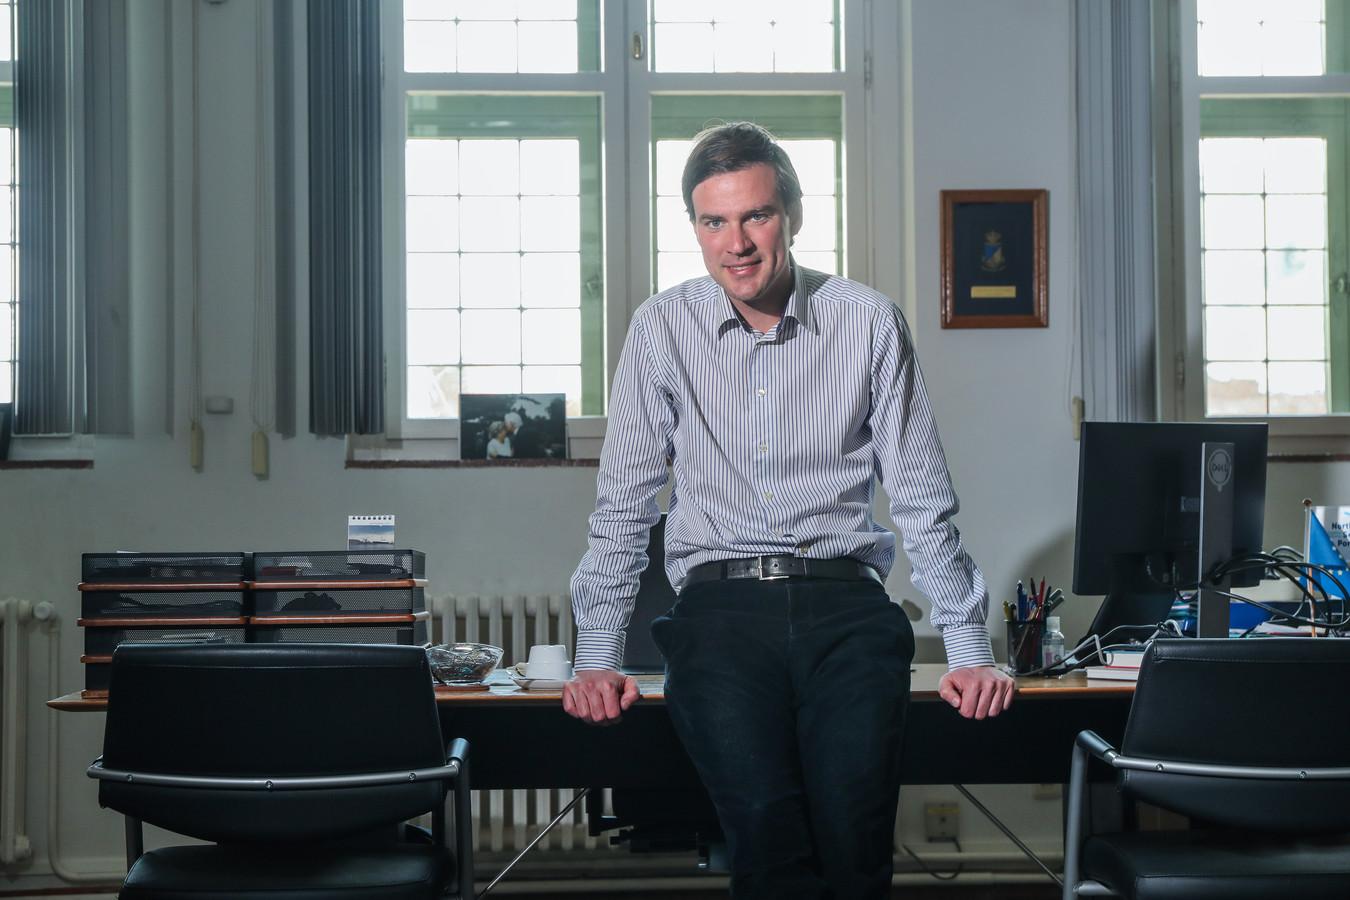 Burgemeester Mathias De Clercq